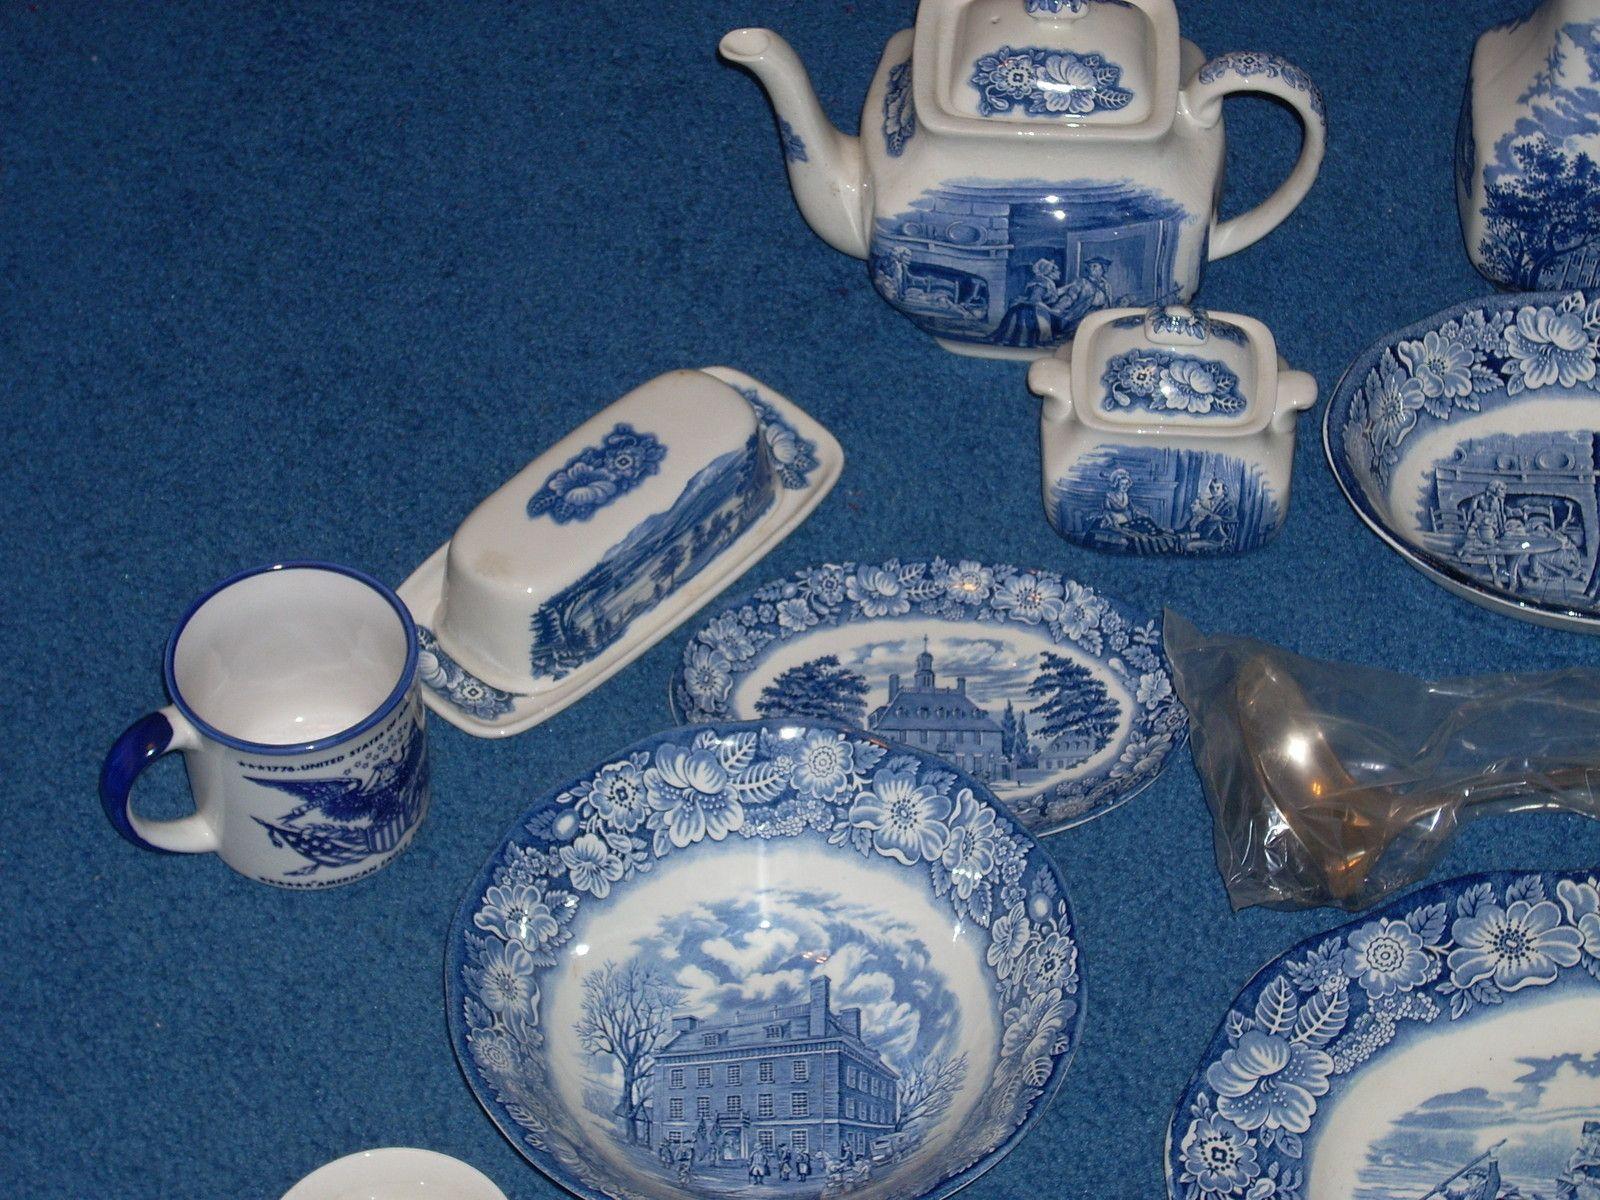 Liberty Blue Bicentennial Staffordshire China Complete Set ...